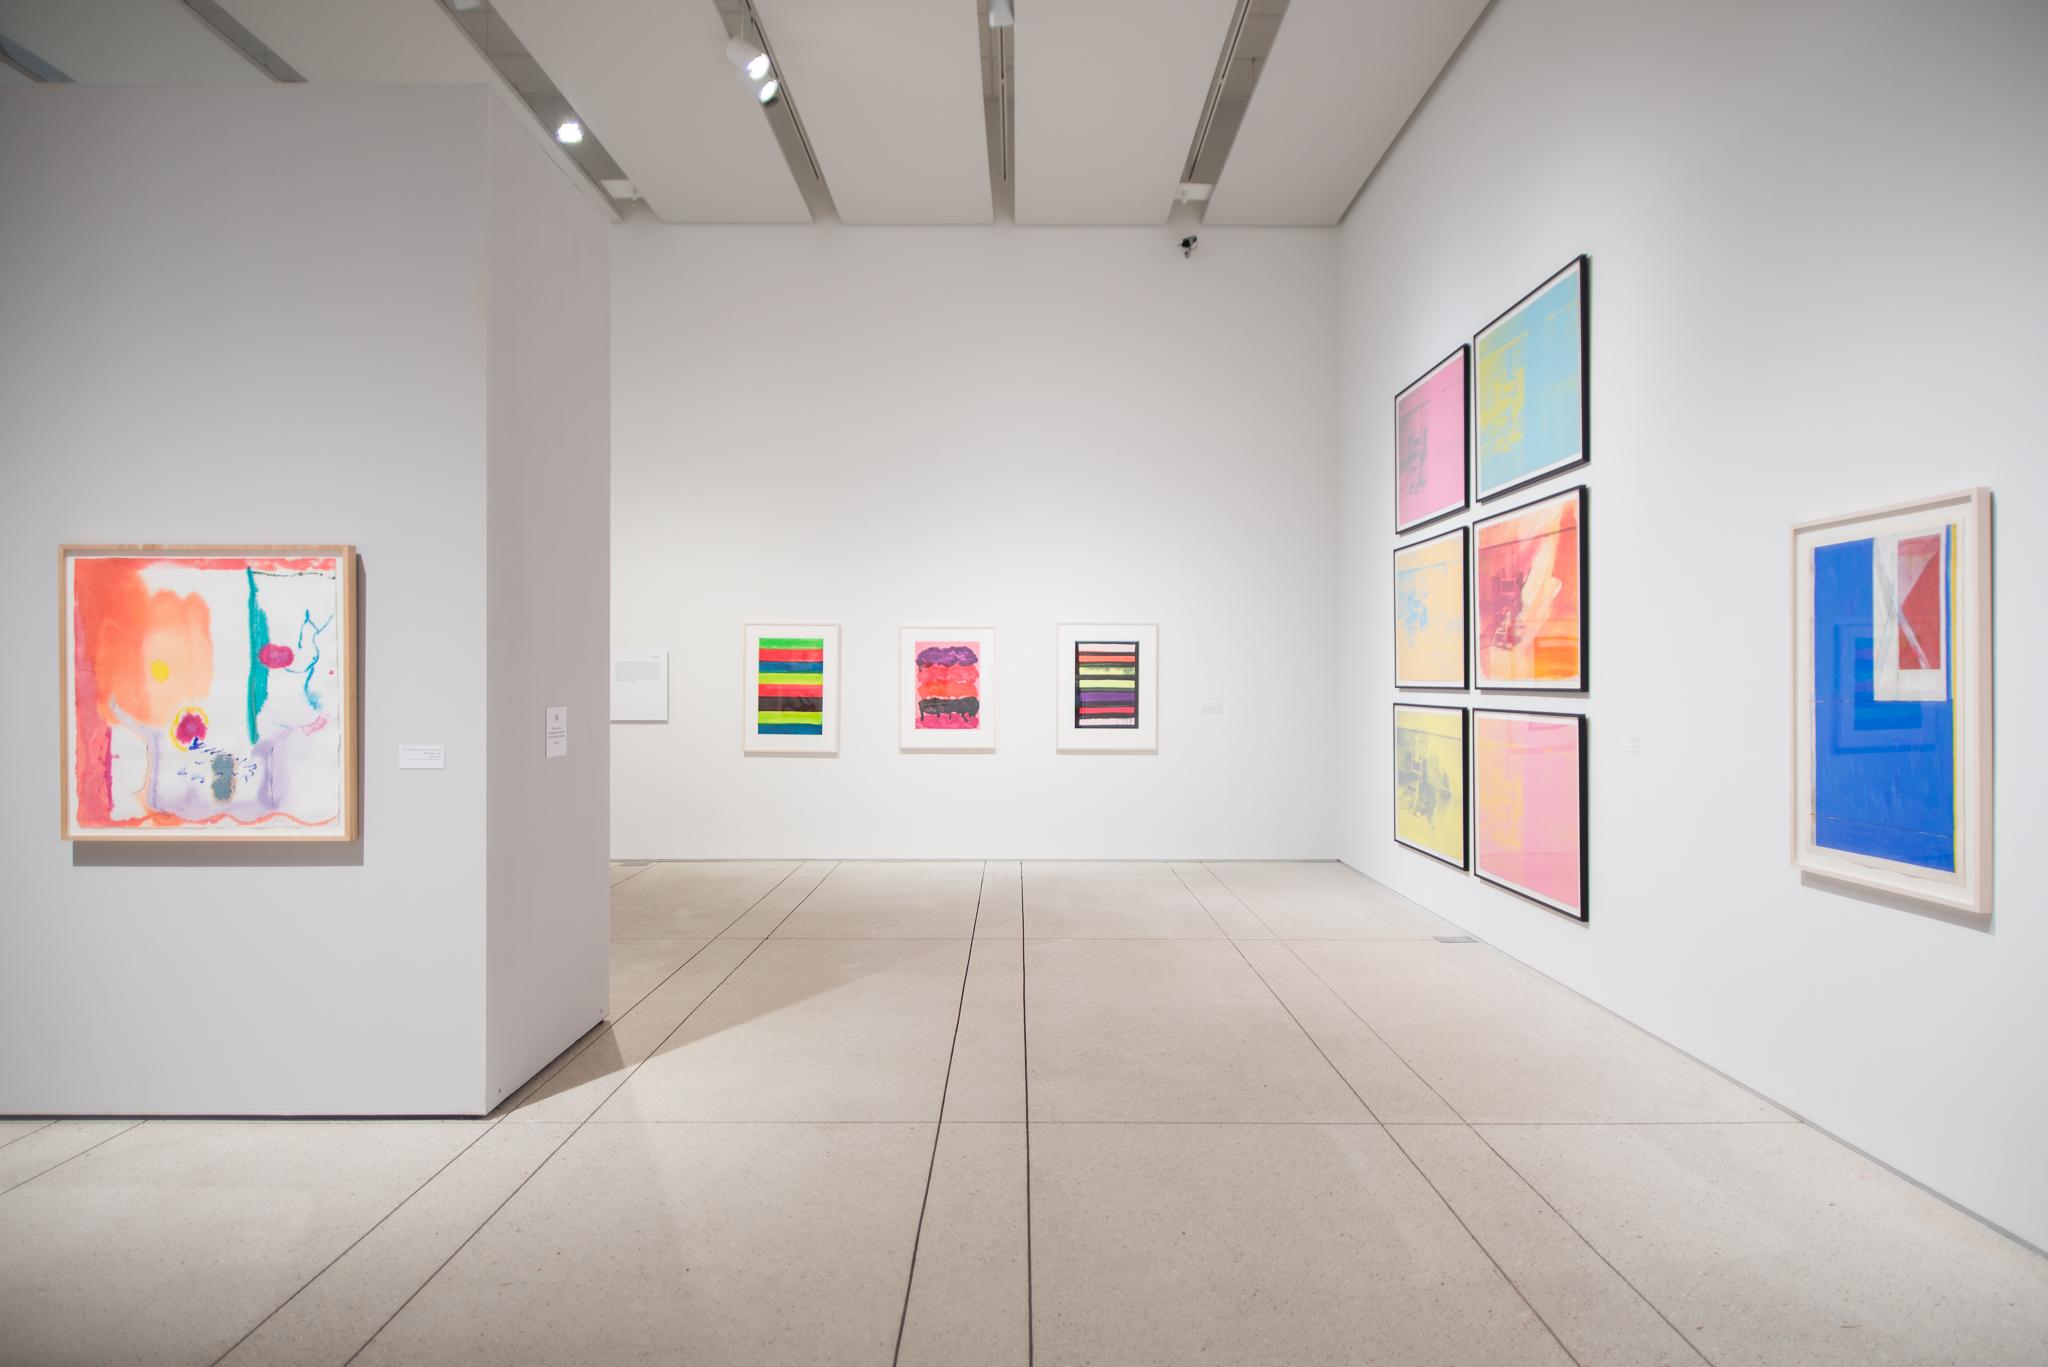 tampa museum--in living color, 24.jpg